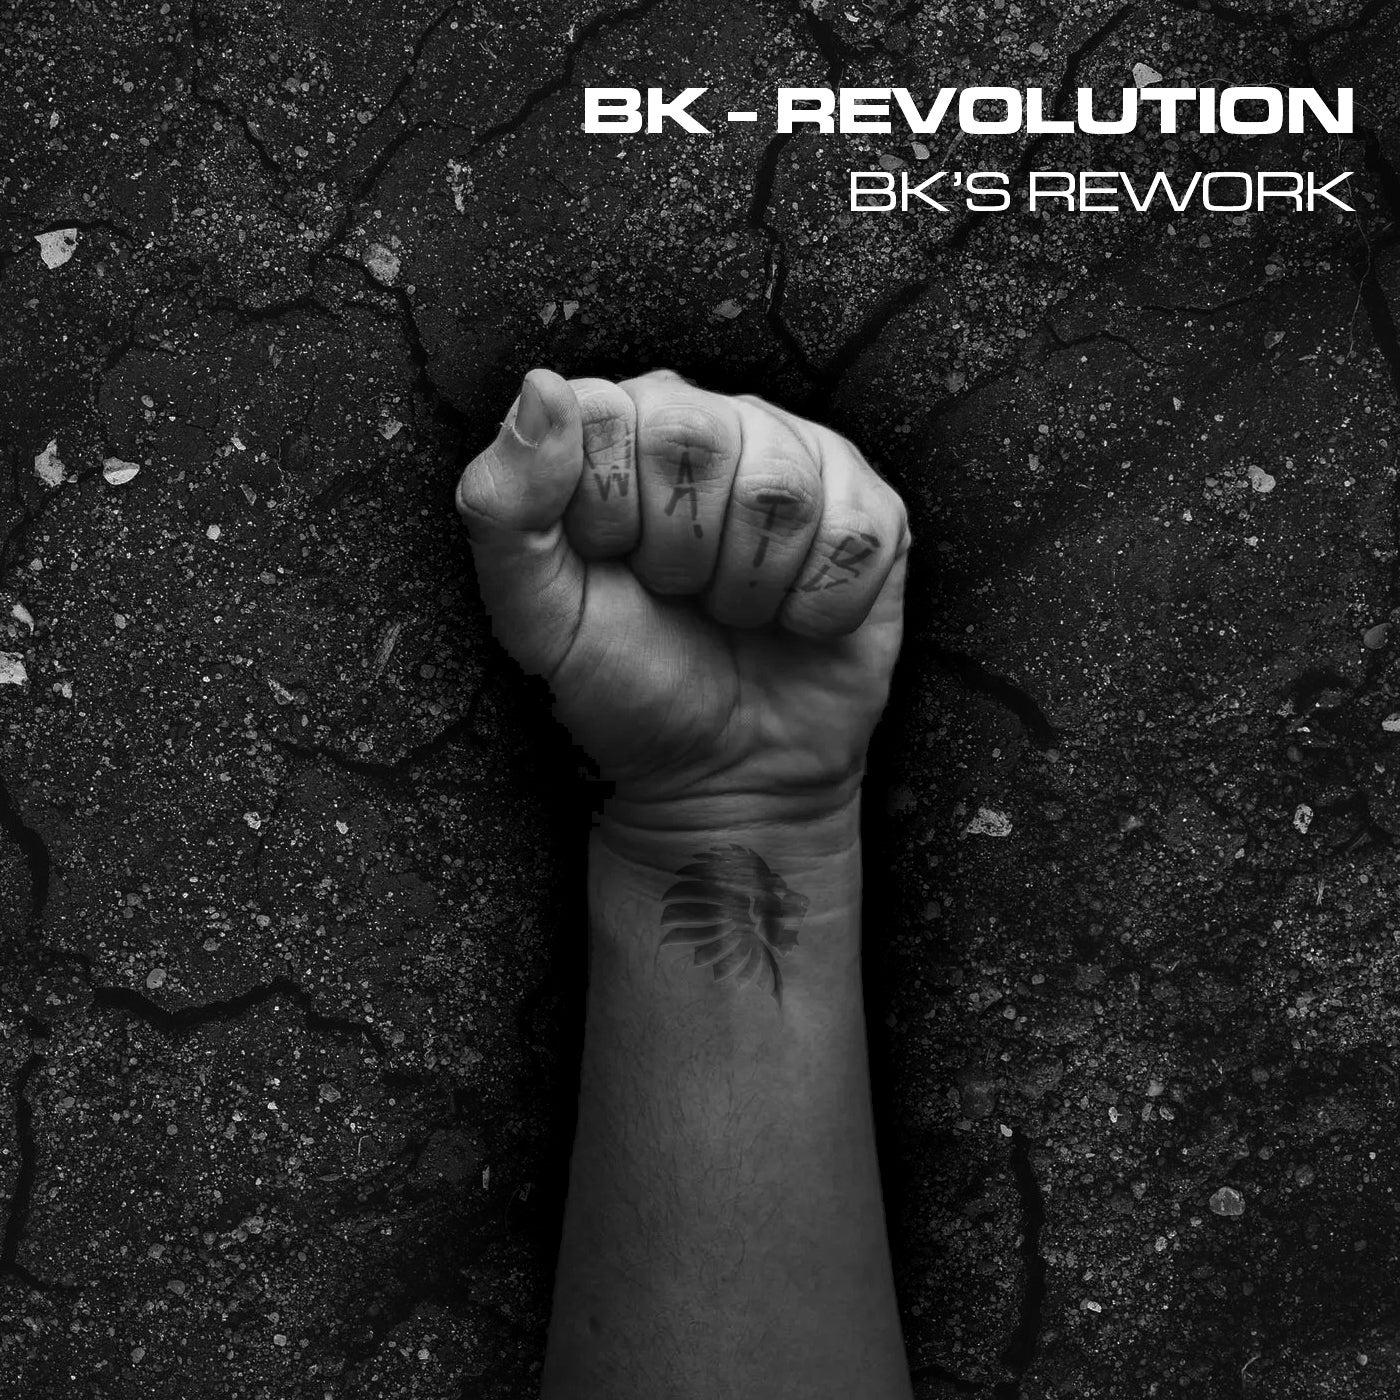 Revolution - BK's Rework (Original Mix)